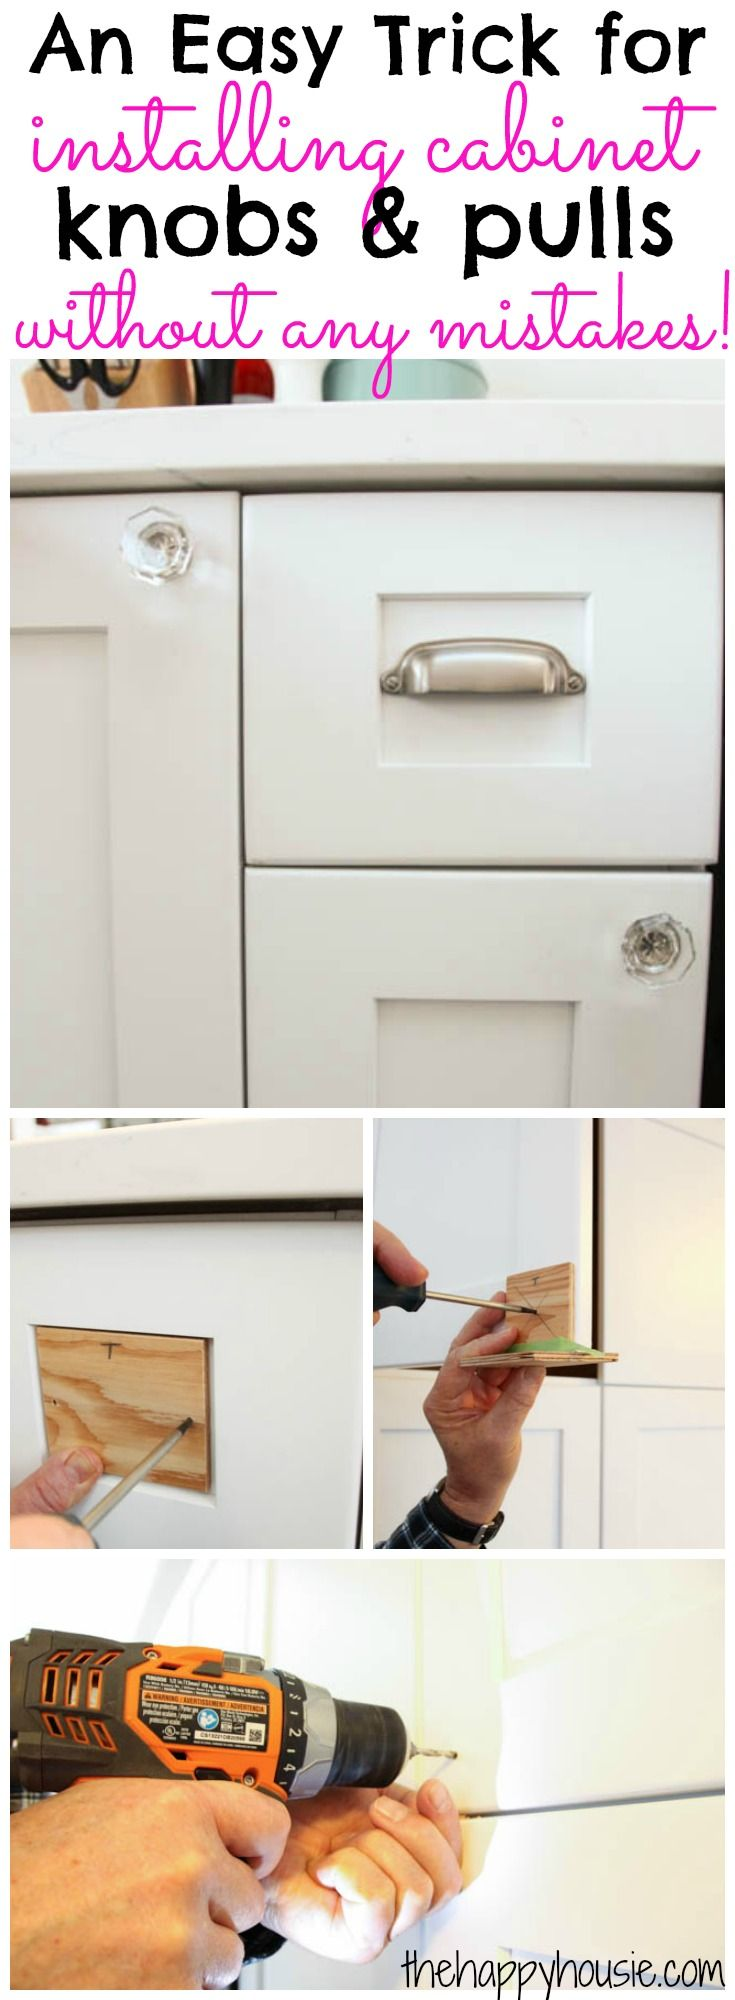 395 best 80\'s cabinets images on Pinterest | Kitchen remodeling ...